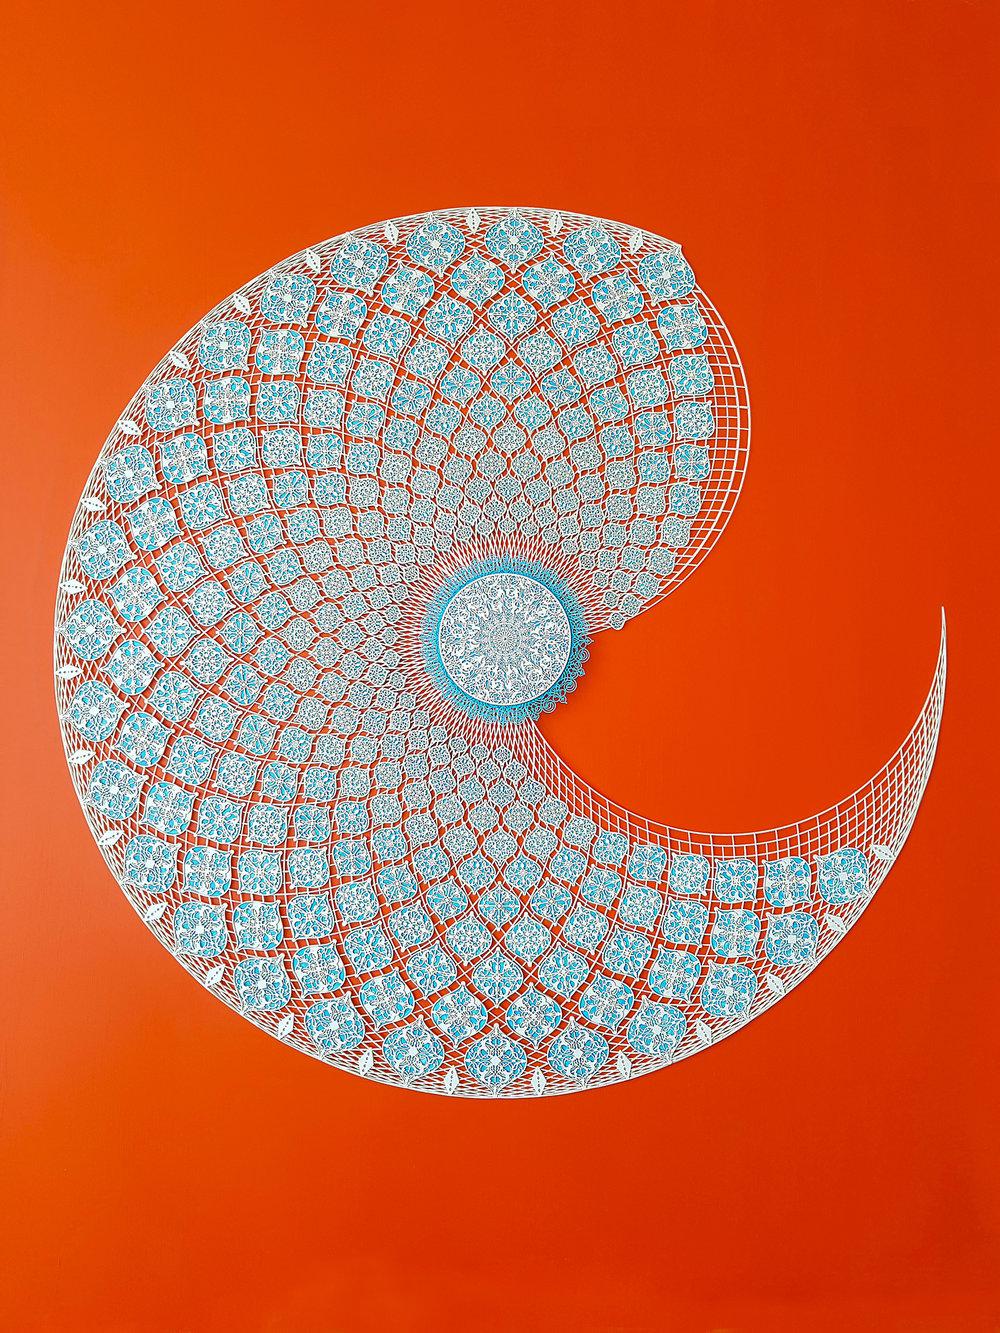 The Sublime Line - 100cm x 125cm - Julia Ibbini - $8,500.jpg